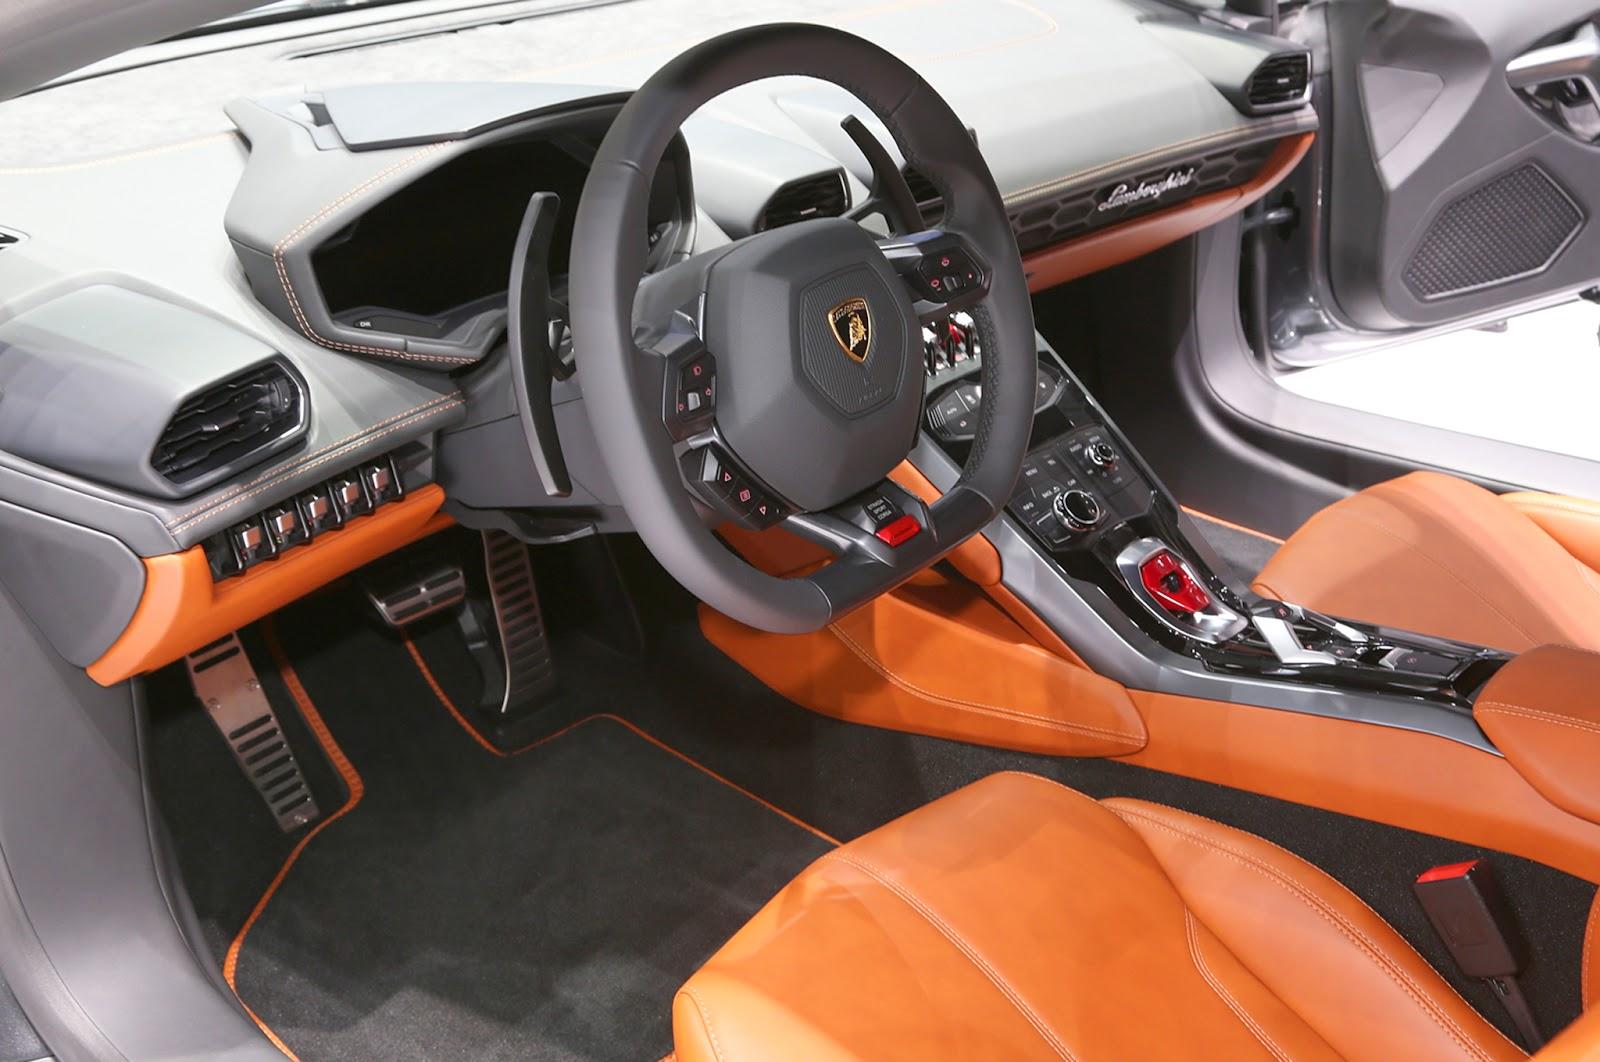 lamborghini huracan interior - Lamborghini Huracan Orange Interior